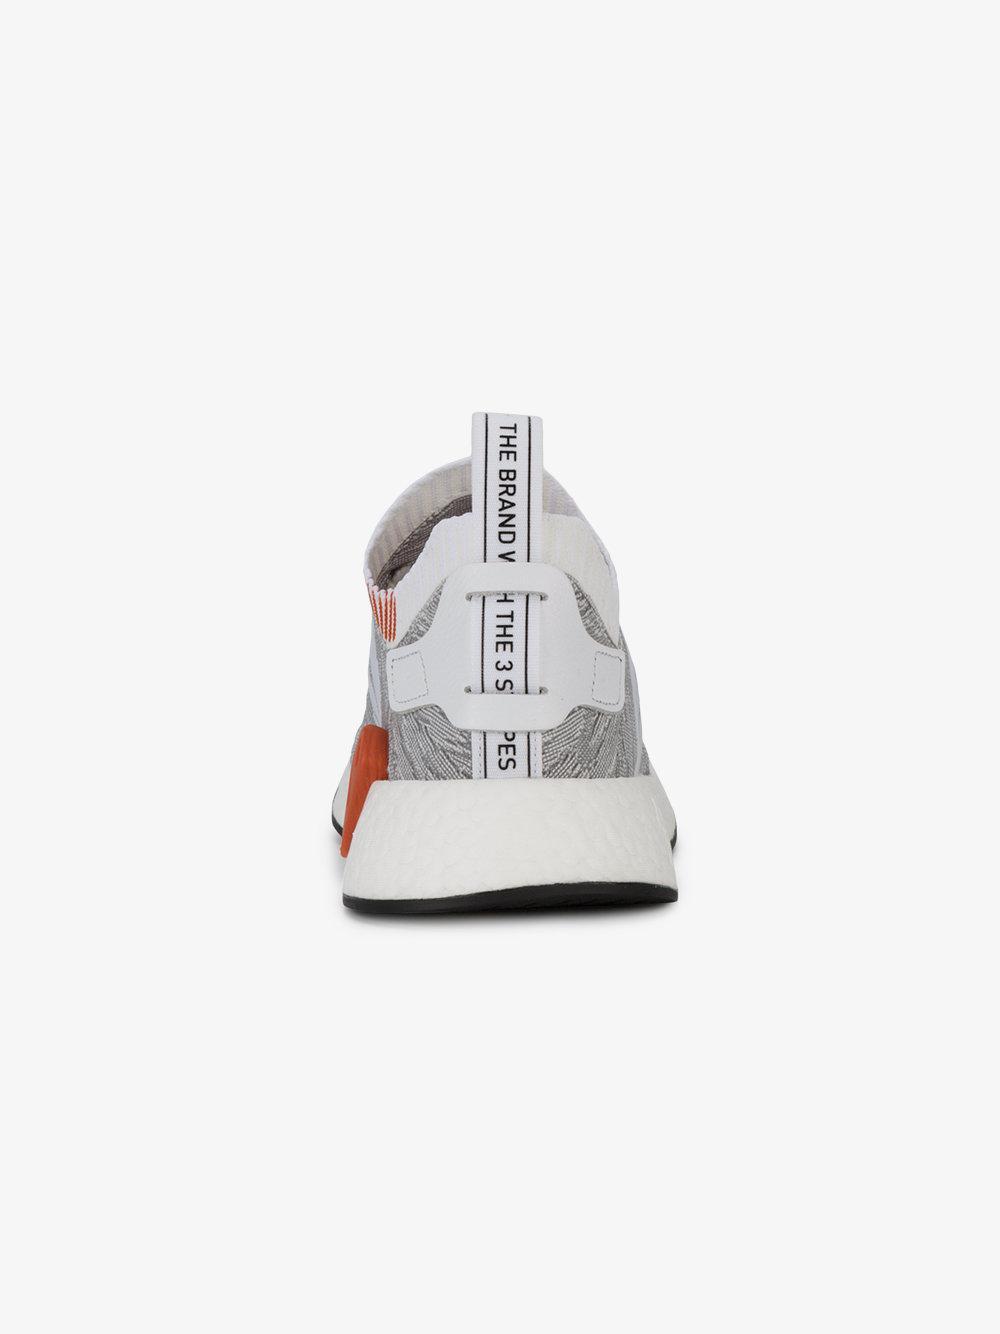 adidas Leather Nmd R2 Primeknit Leopard